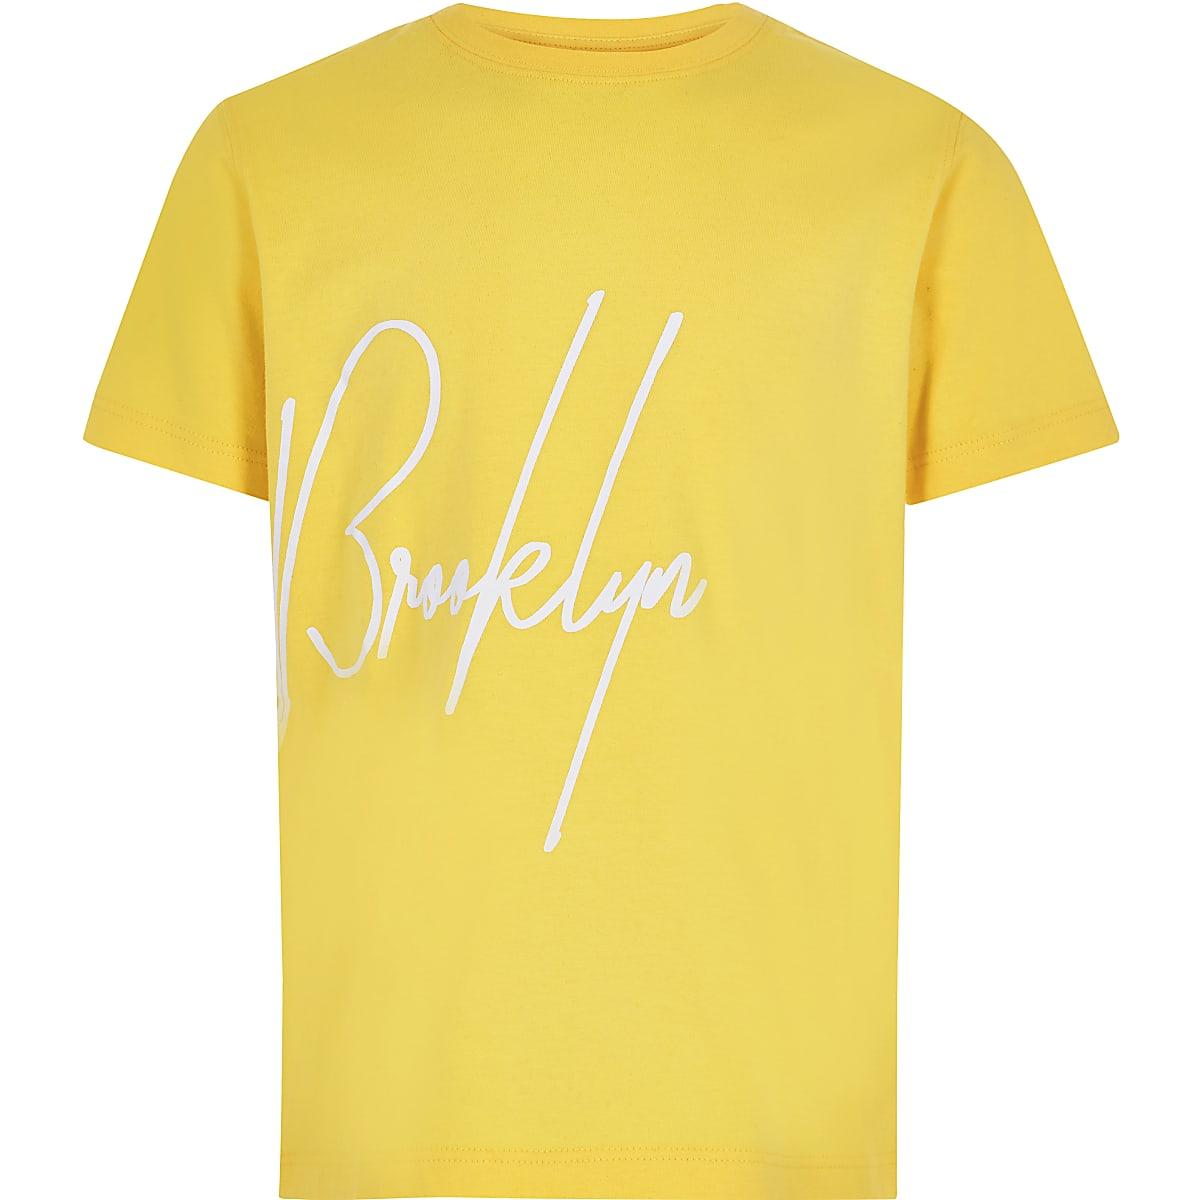 Boys yellow 'Brooklyn' T-shirt